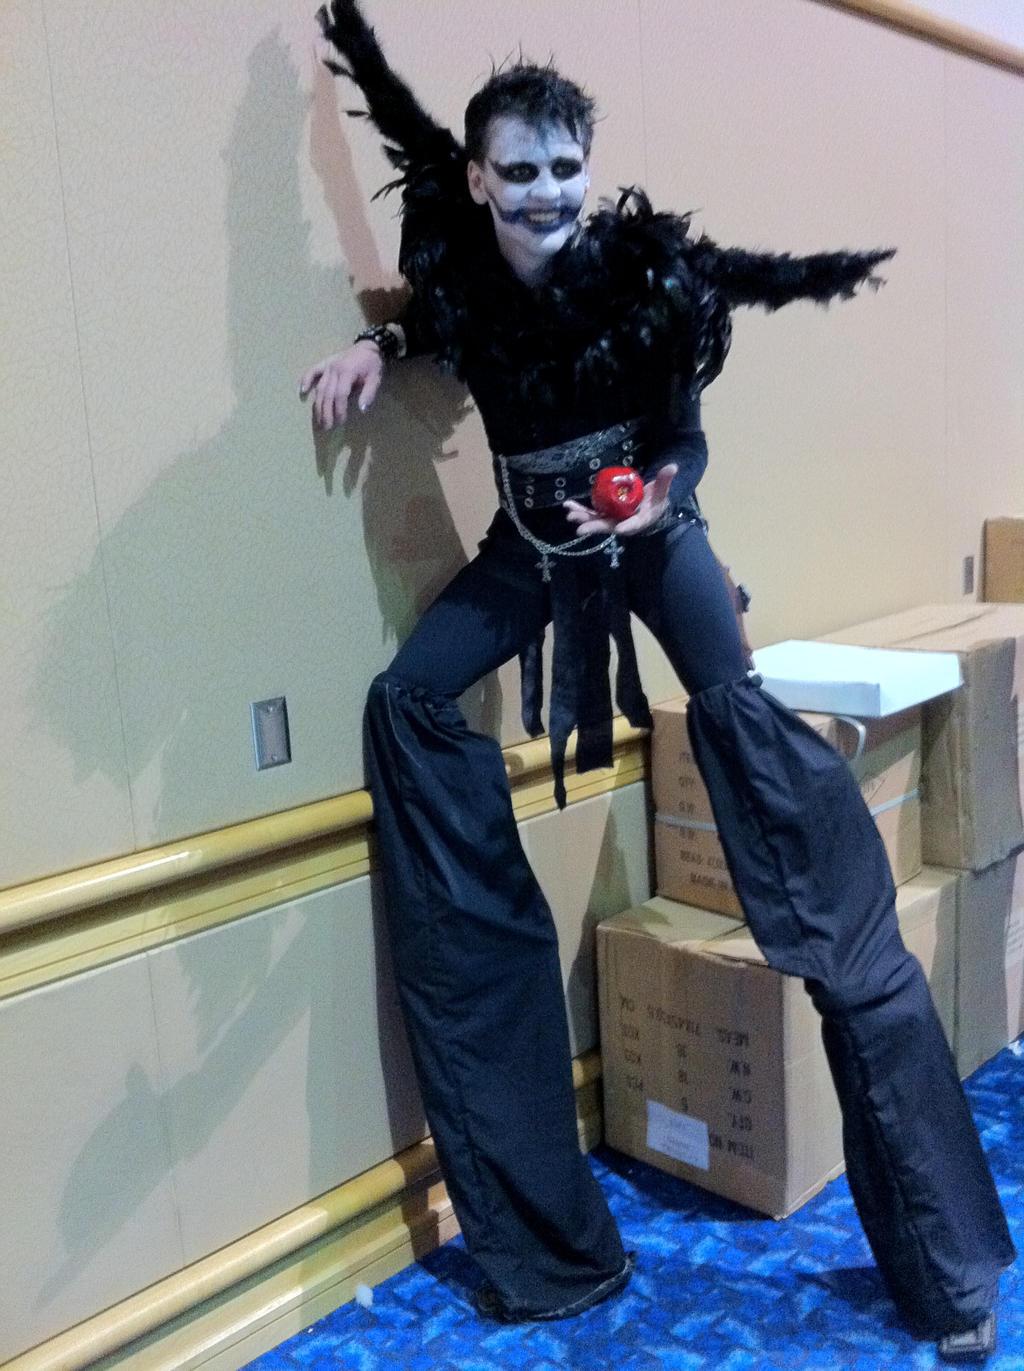 Ryuk cosplay MetroCon 2013 by KcKreations on DeviantArt